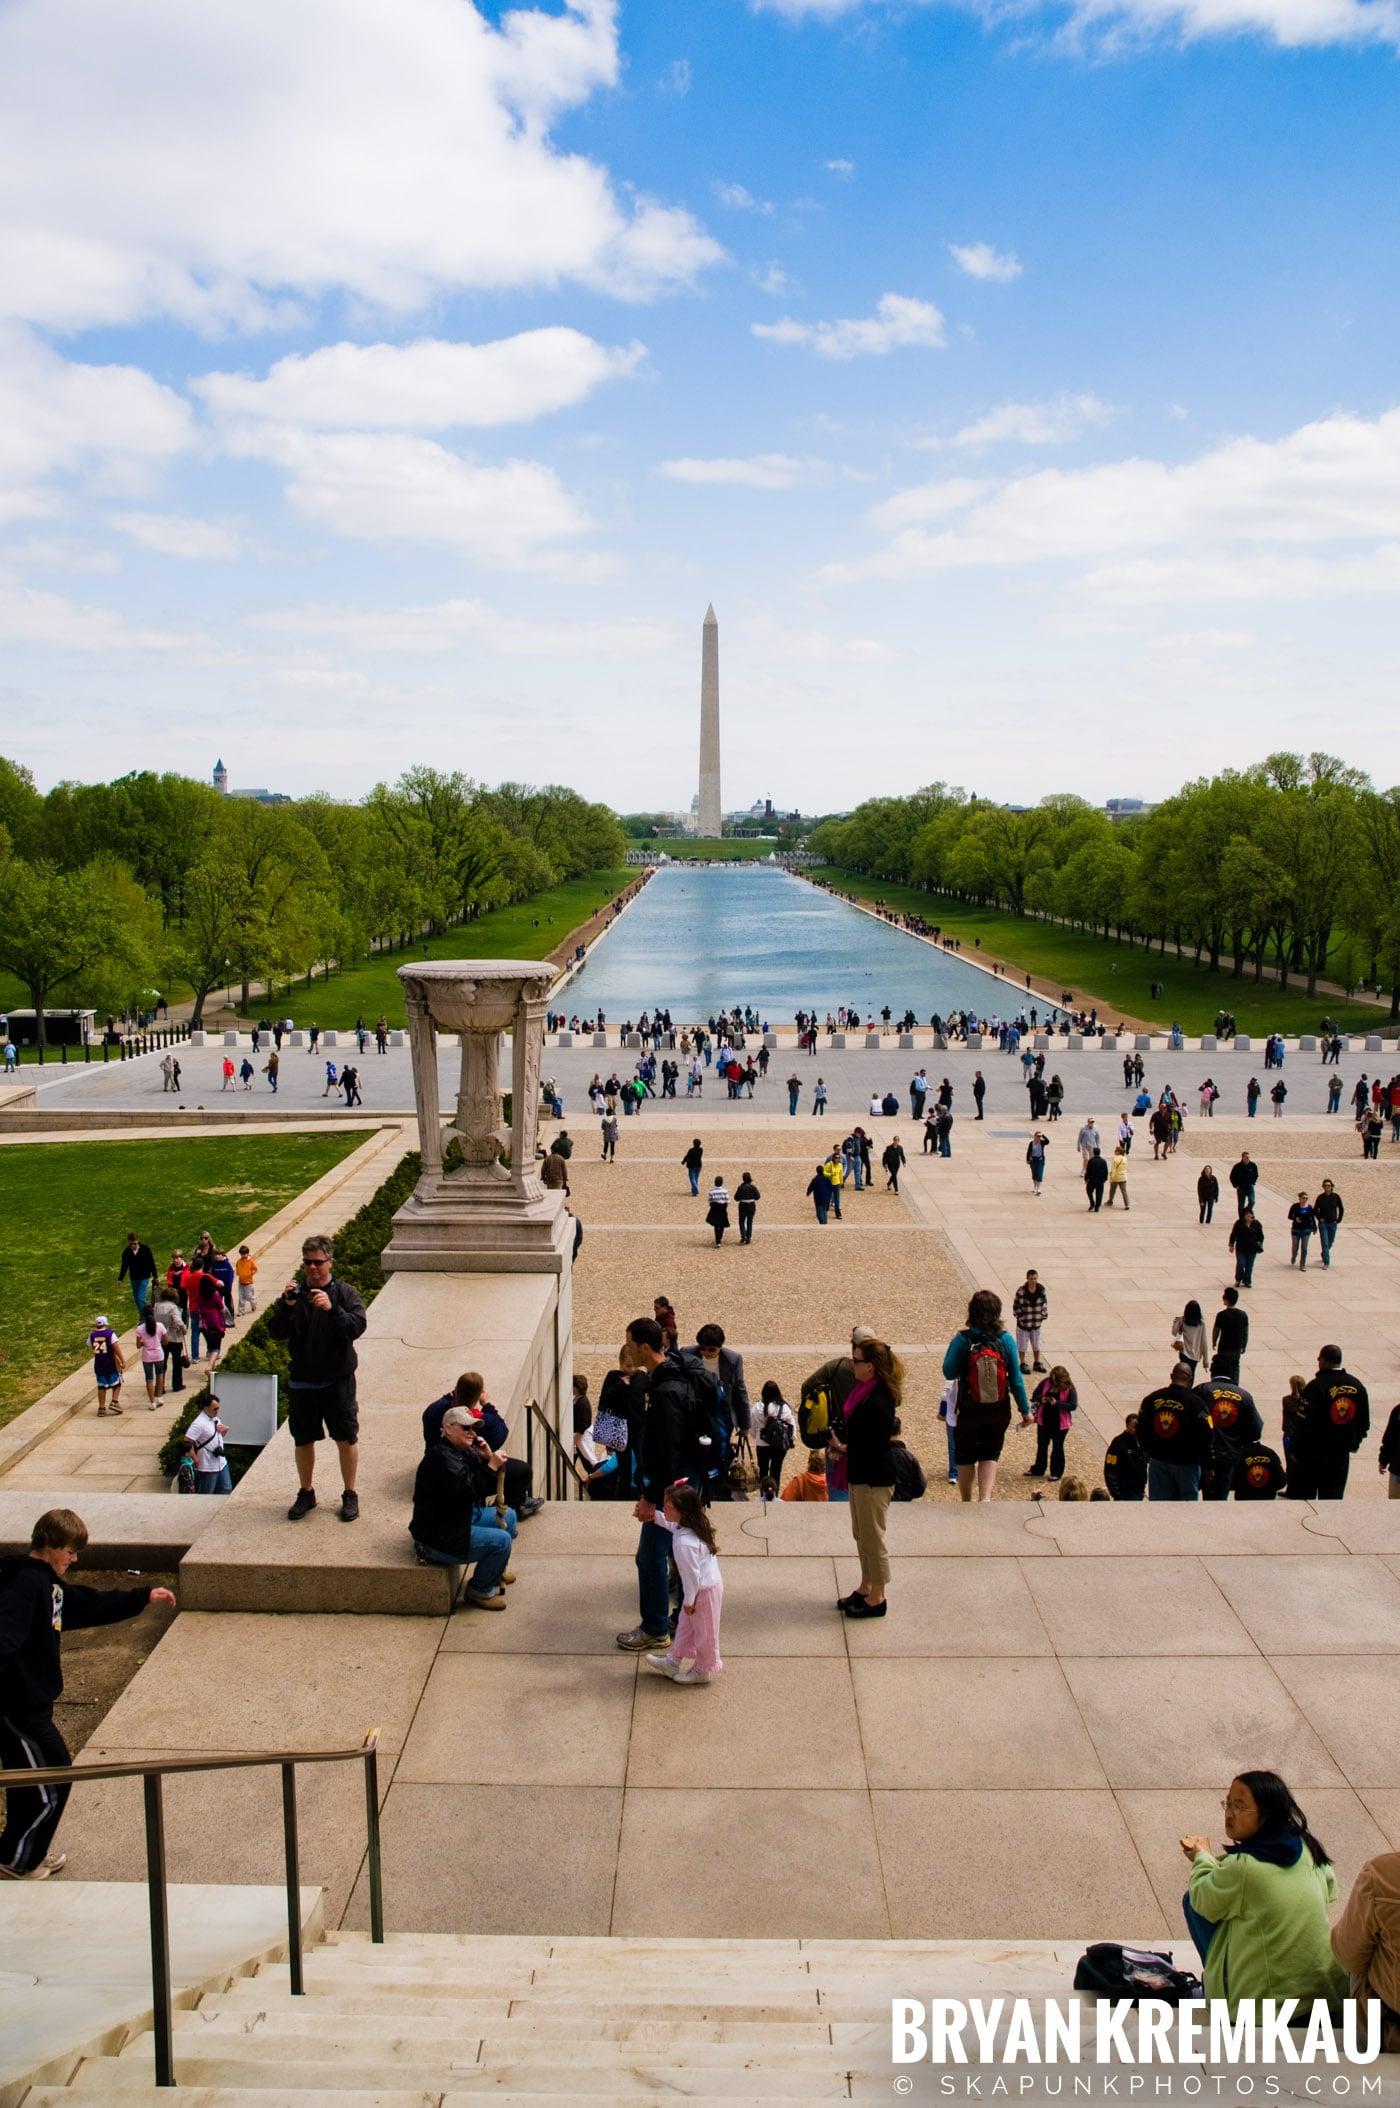 Washington, DC Trip - Day 2 - 4.9.10 (11)